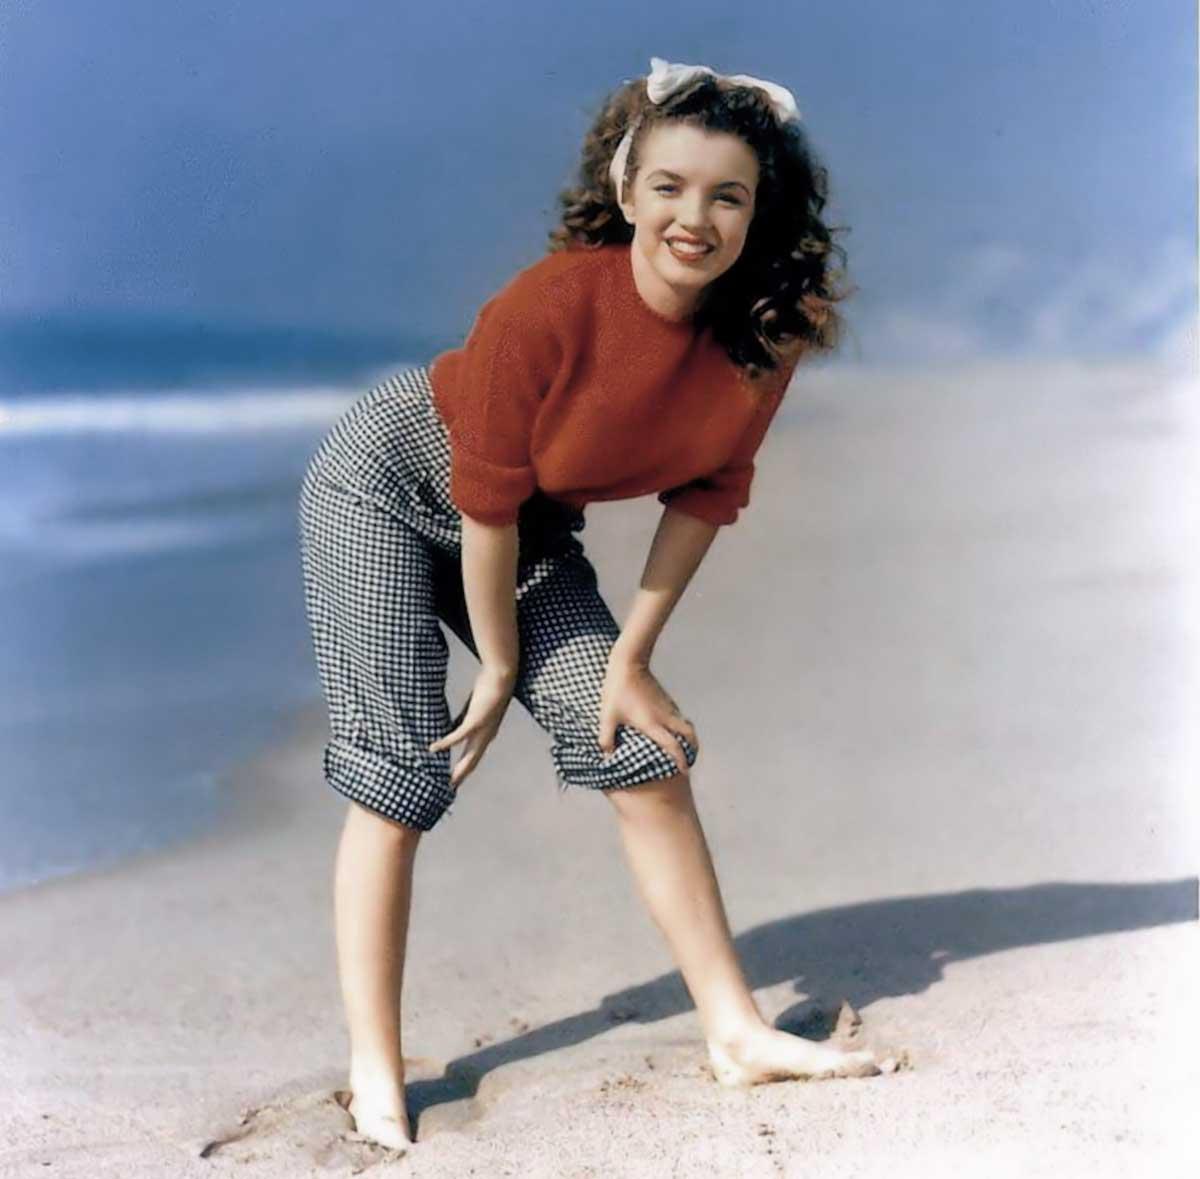 Marilyn-Monroe-sweater-girl-1945